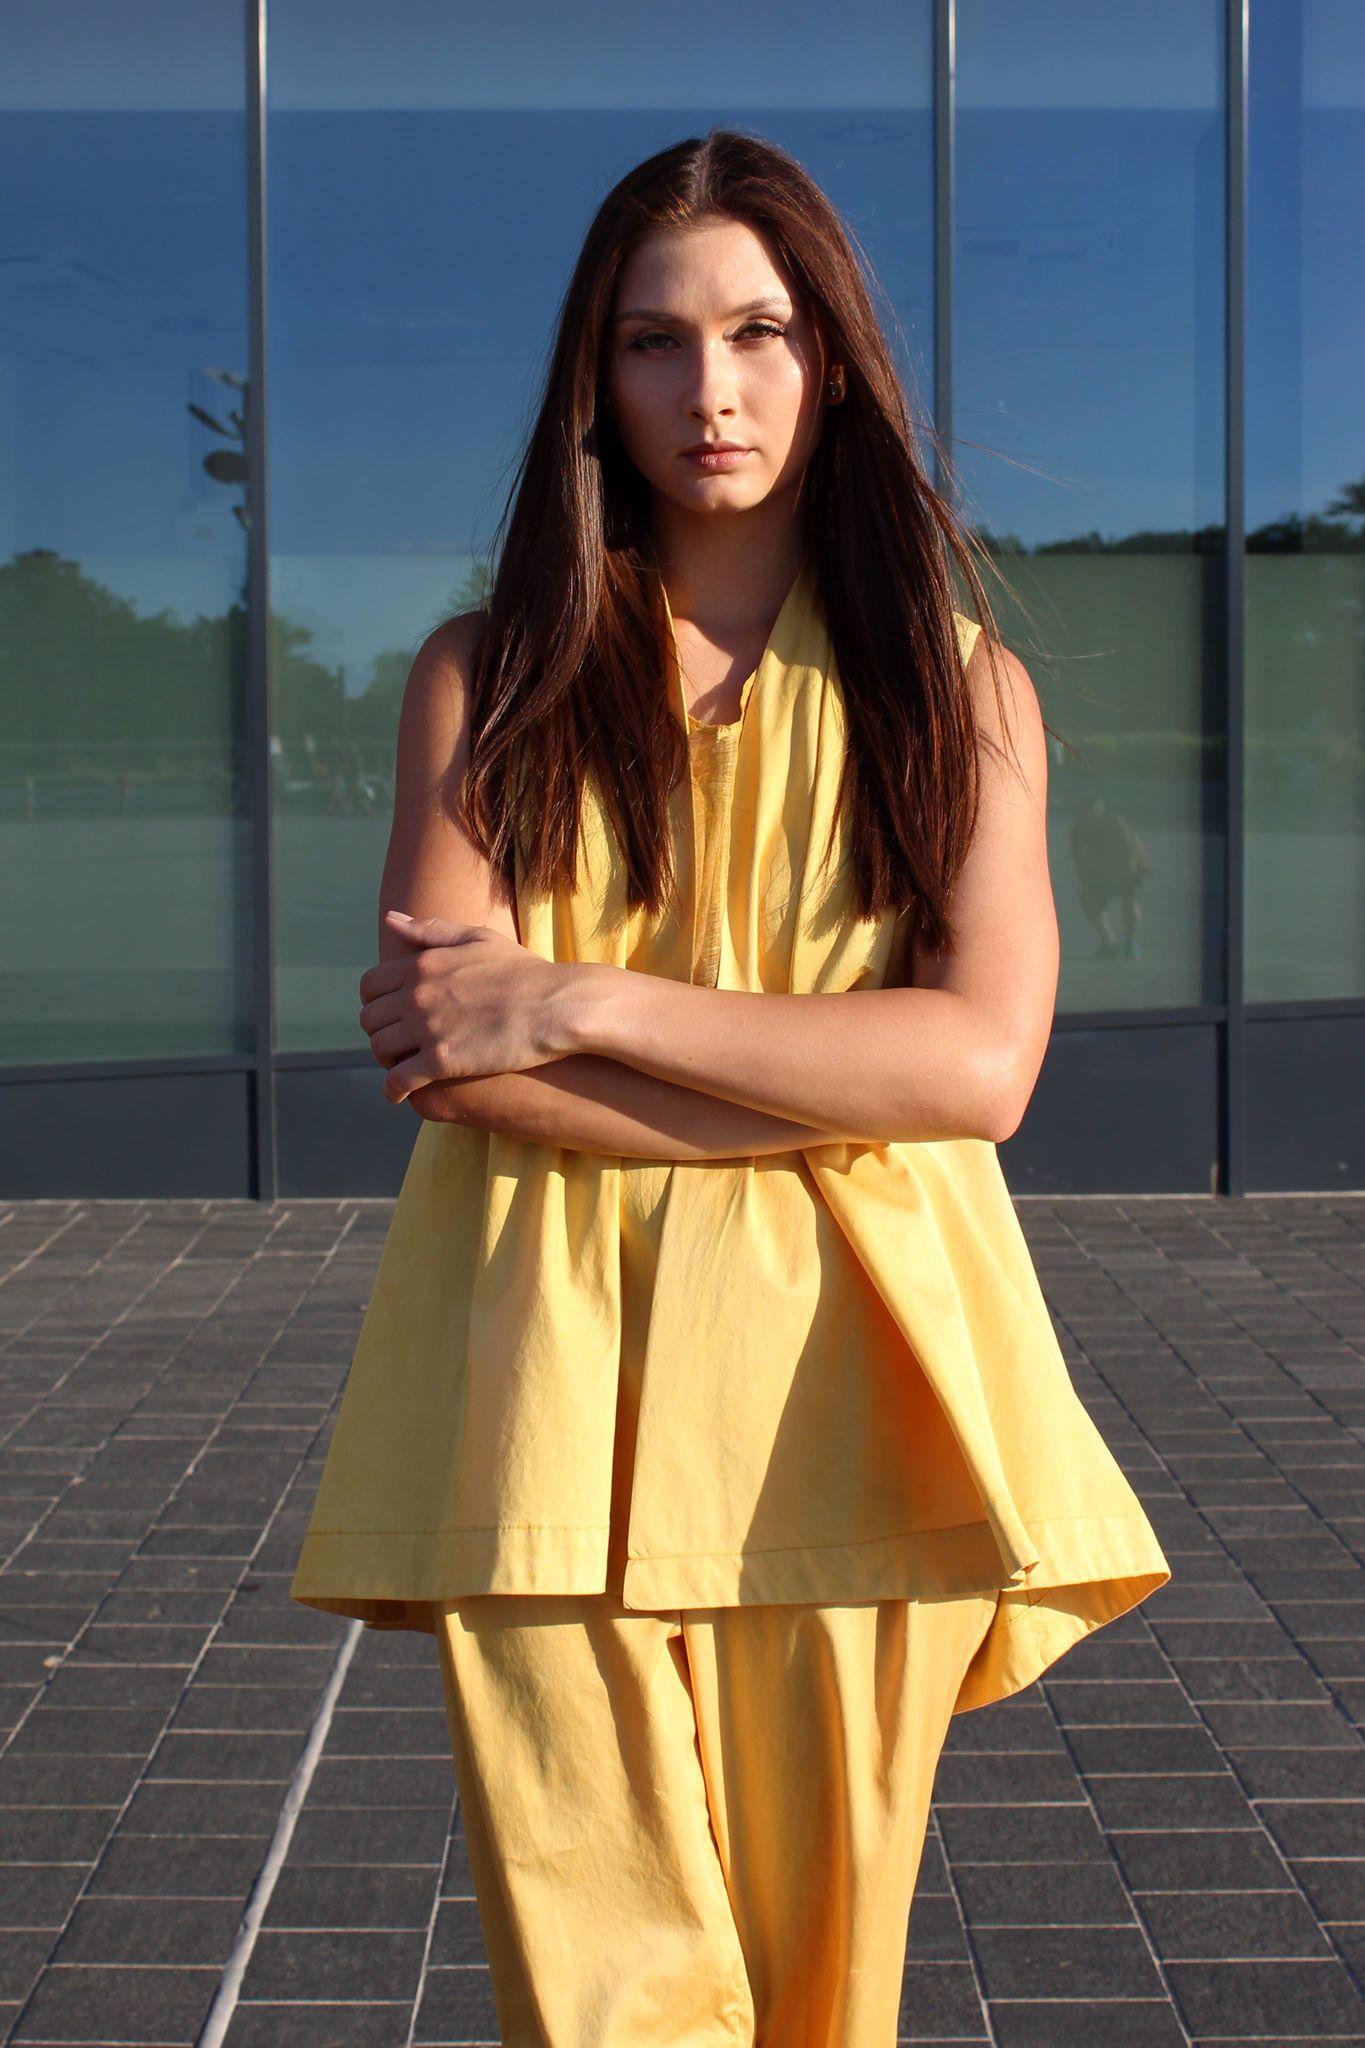 Model: Dominika Árki Makeup: Mónika Varga ©️Nikolett Madai